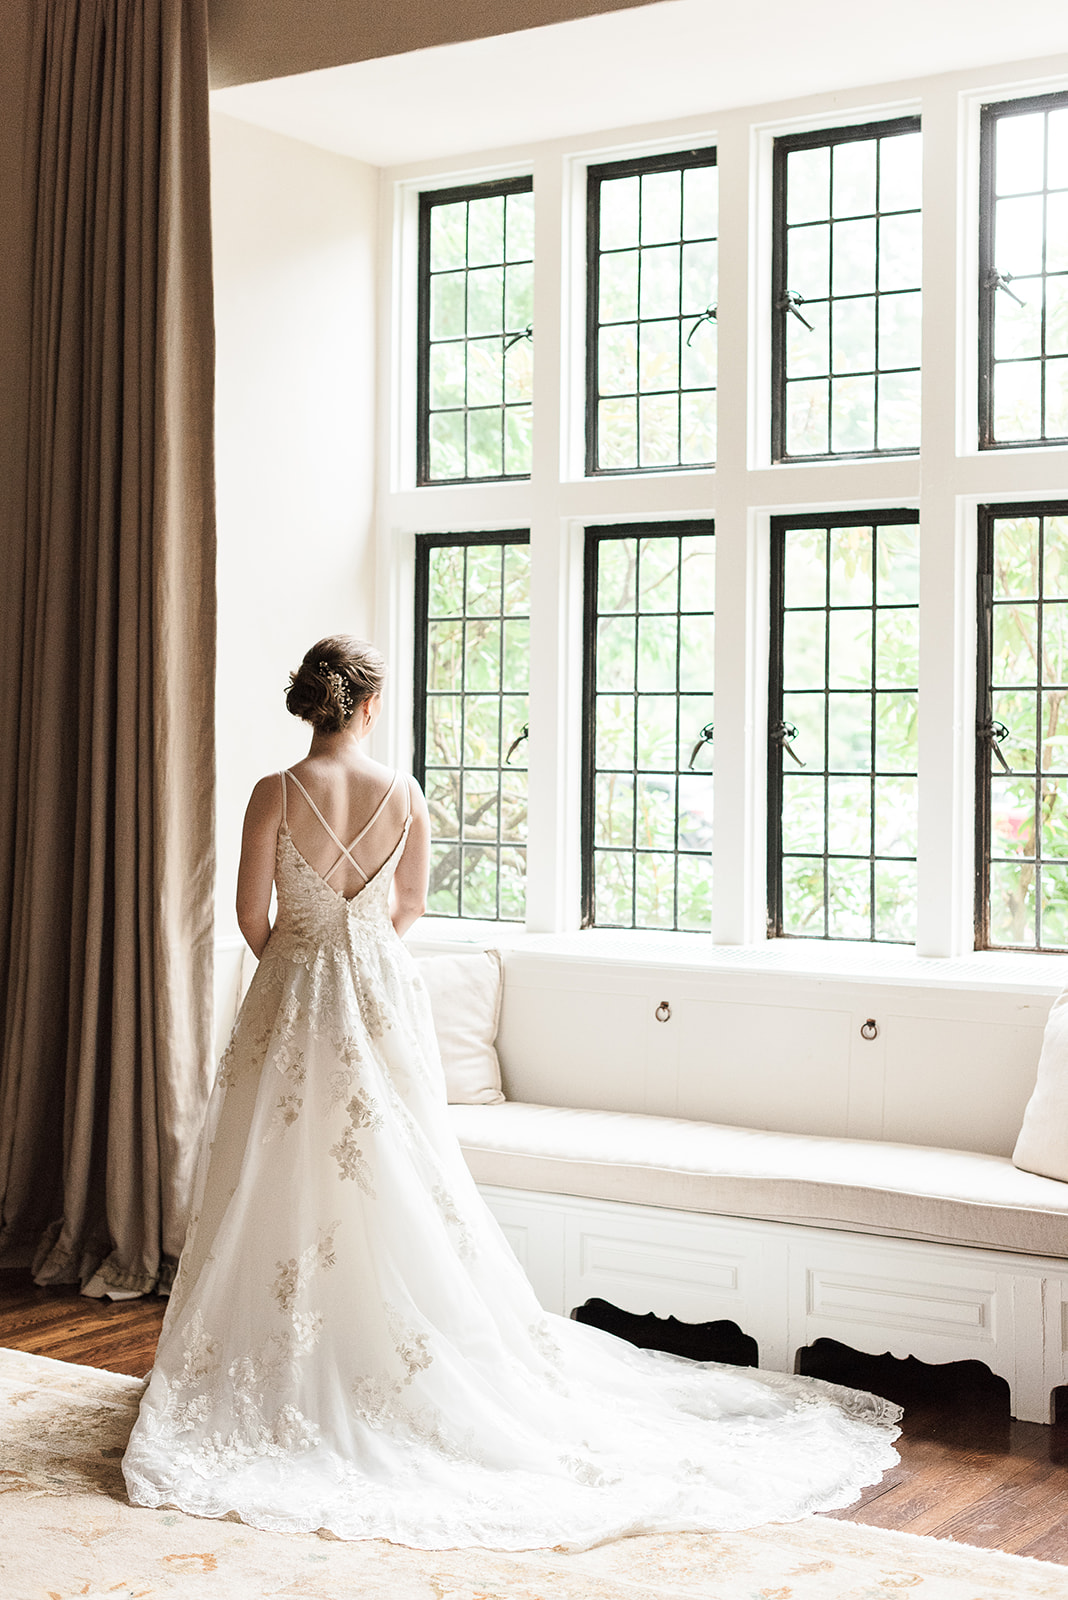 Lloyd+Wedding+by+Michelle+Lange+Photography-145.jpg